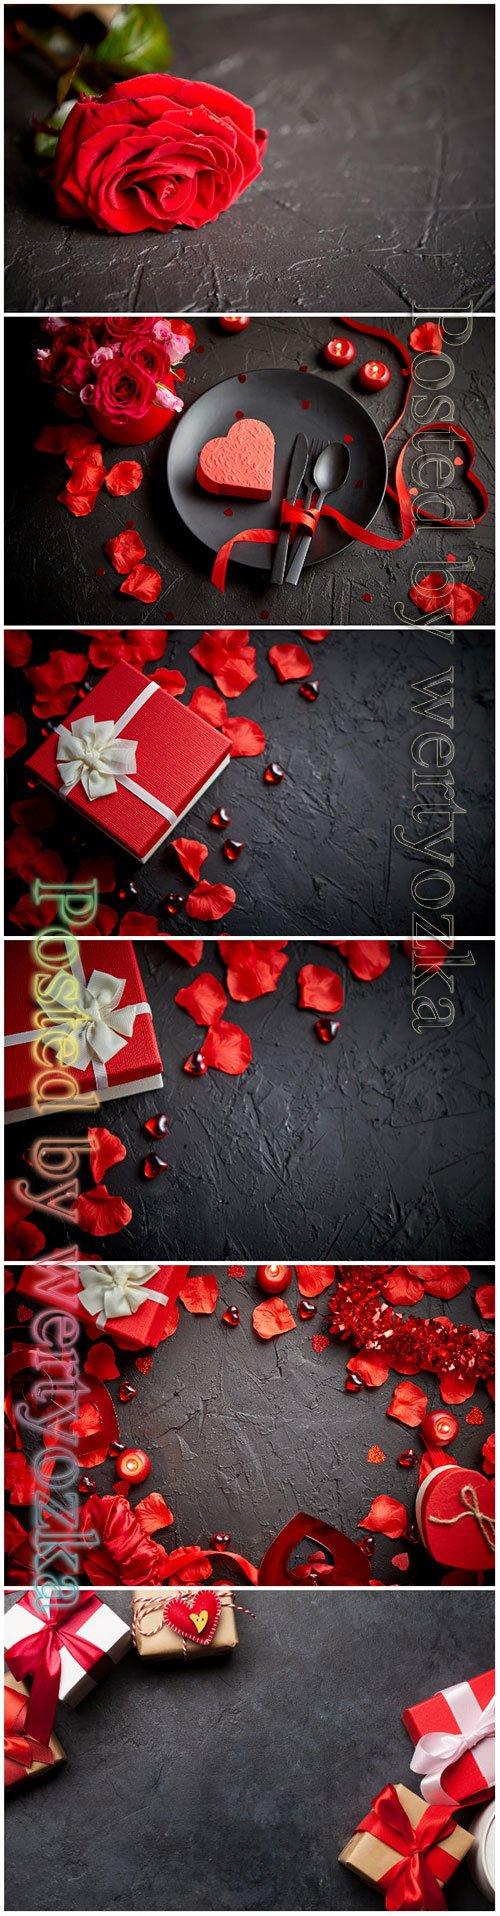 Valentines day beautiful stock photo # 6